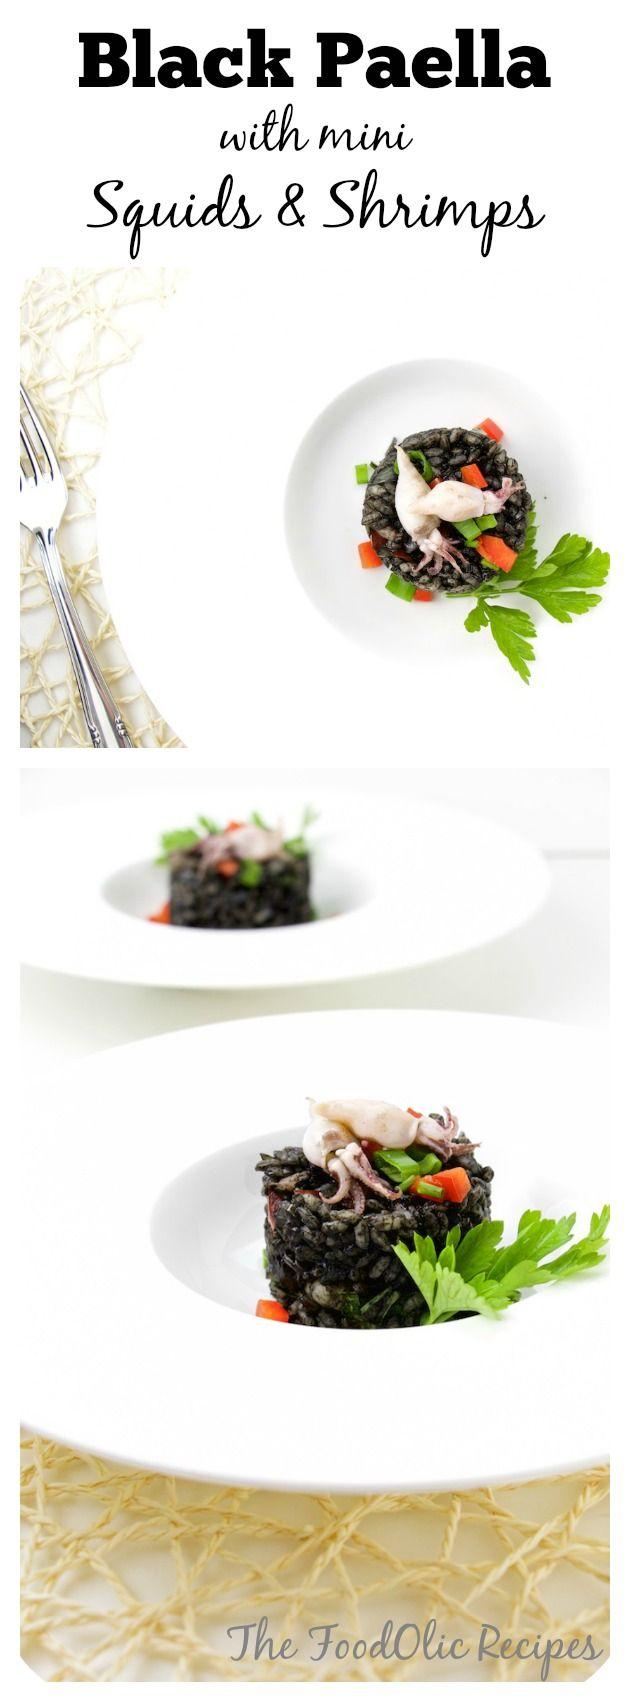 Cuttlefish recipes spanish